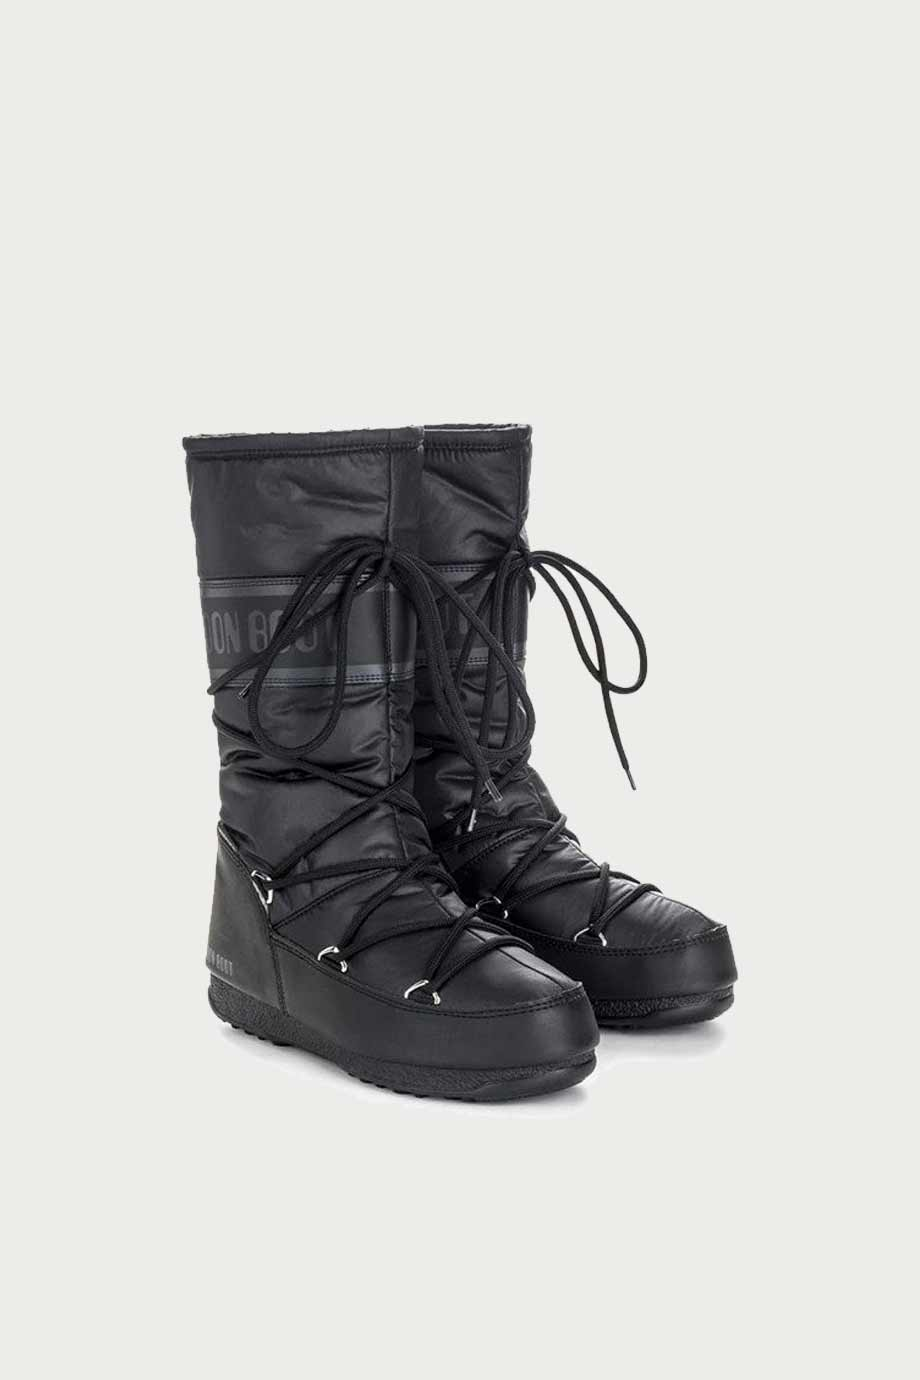 spiridoula metheniti shoes xalkida p 24009100 001 black high laces MoonBoot 3